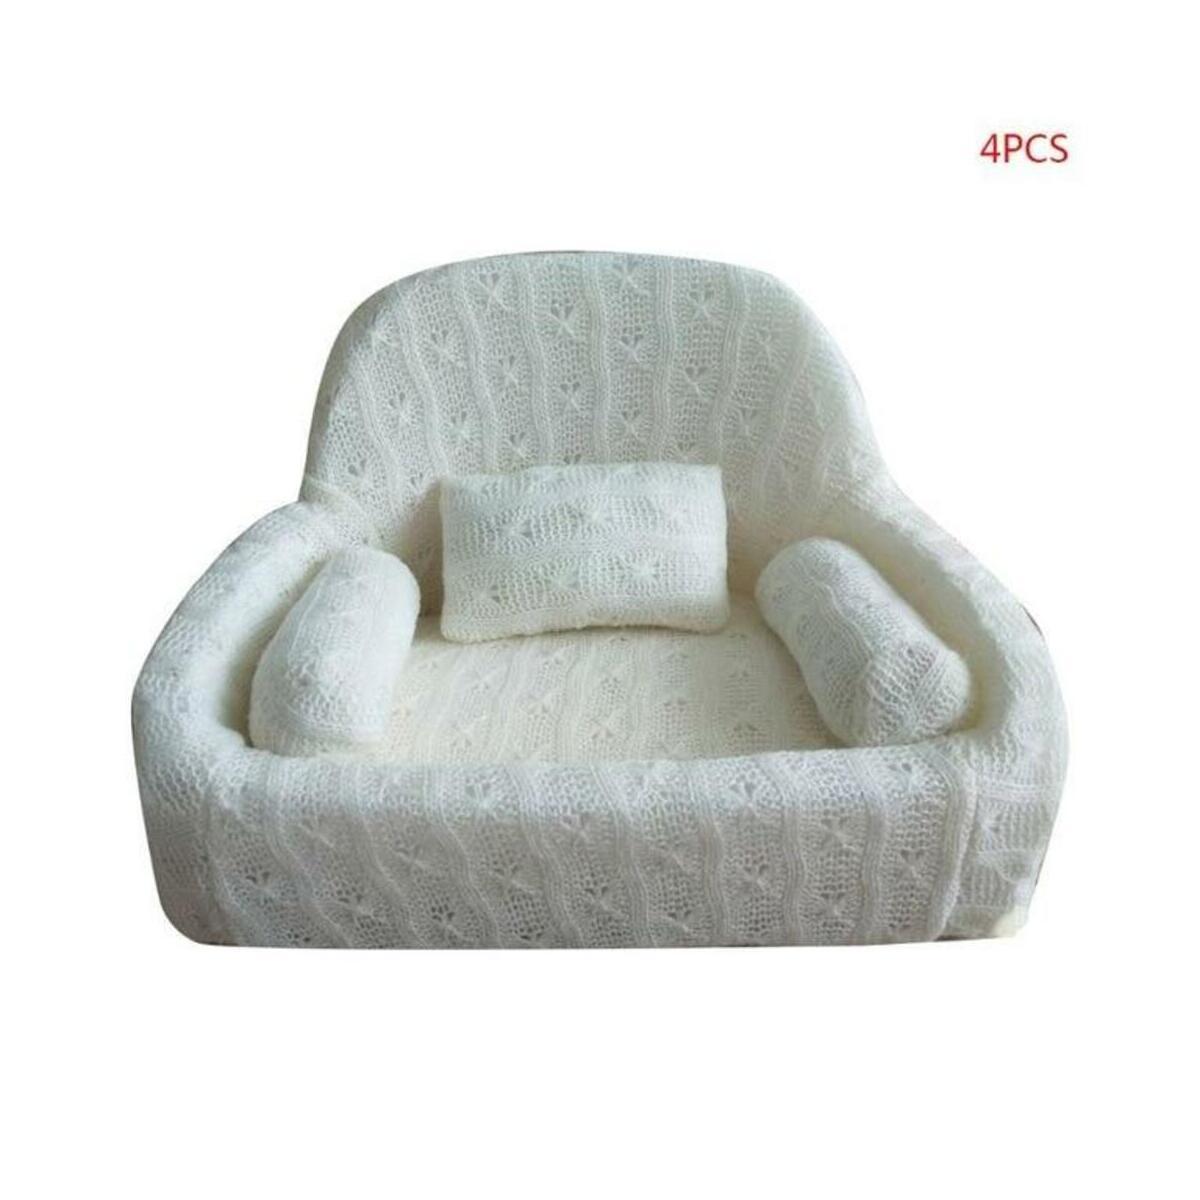 Pets Baby Sofa Pillow Set Chair 4 pcs/set